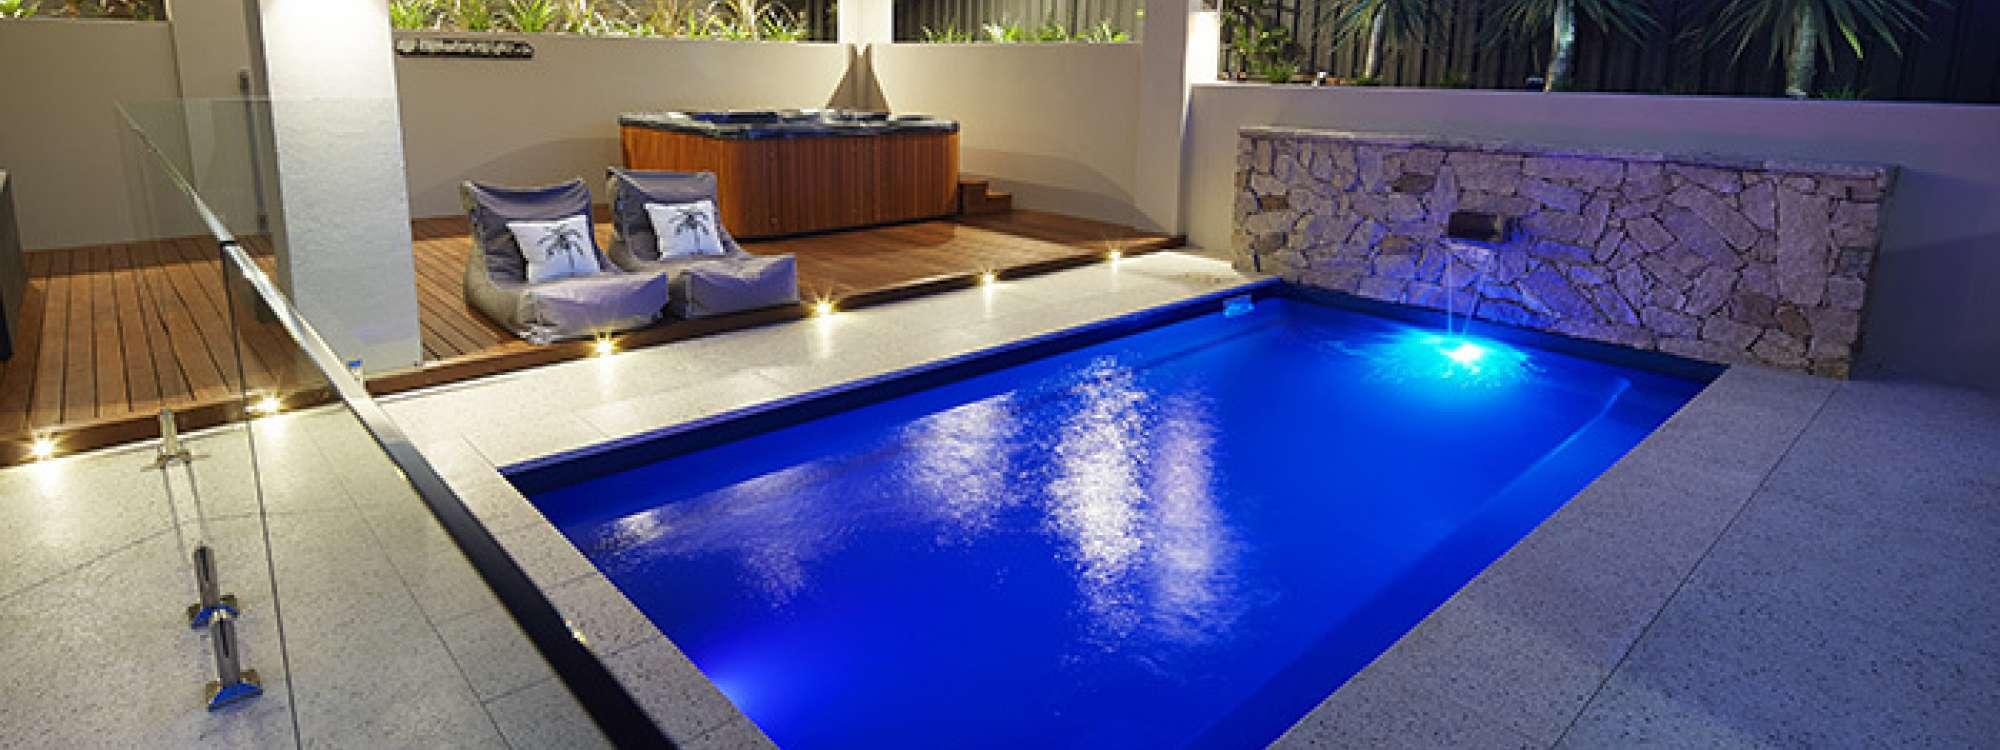 Caprice Range Fibreglass Pool